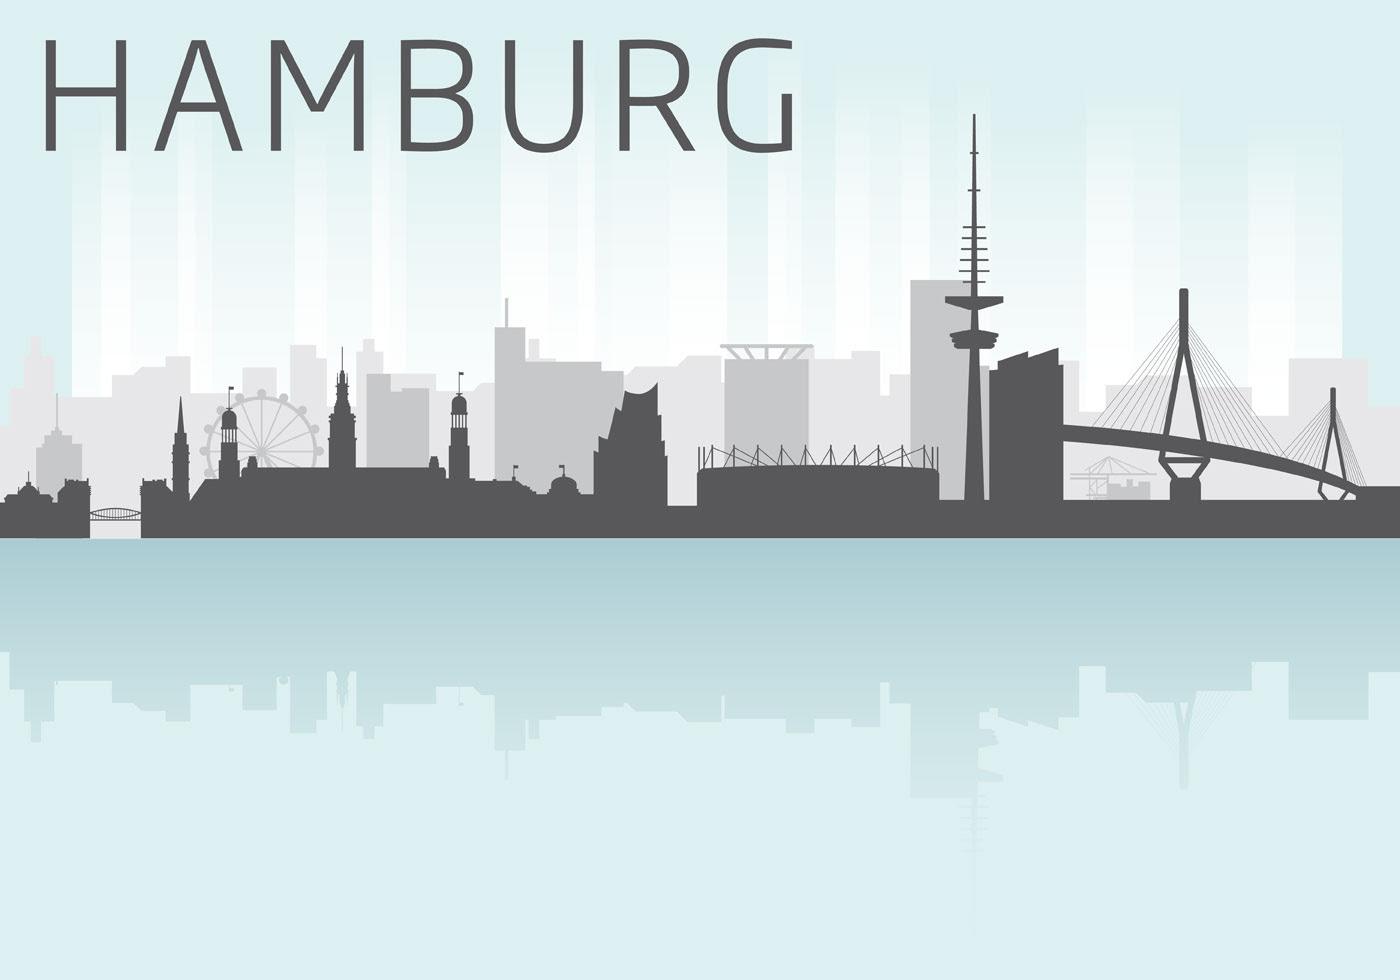 hamburg skyline vector